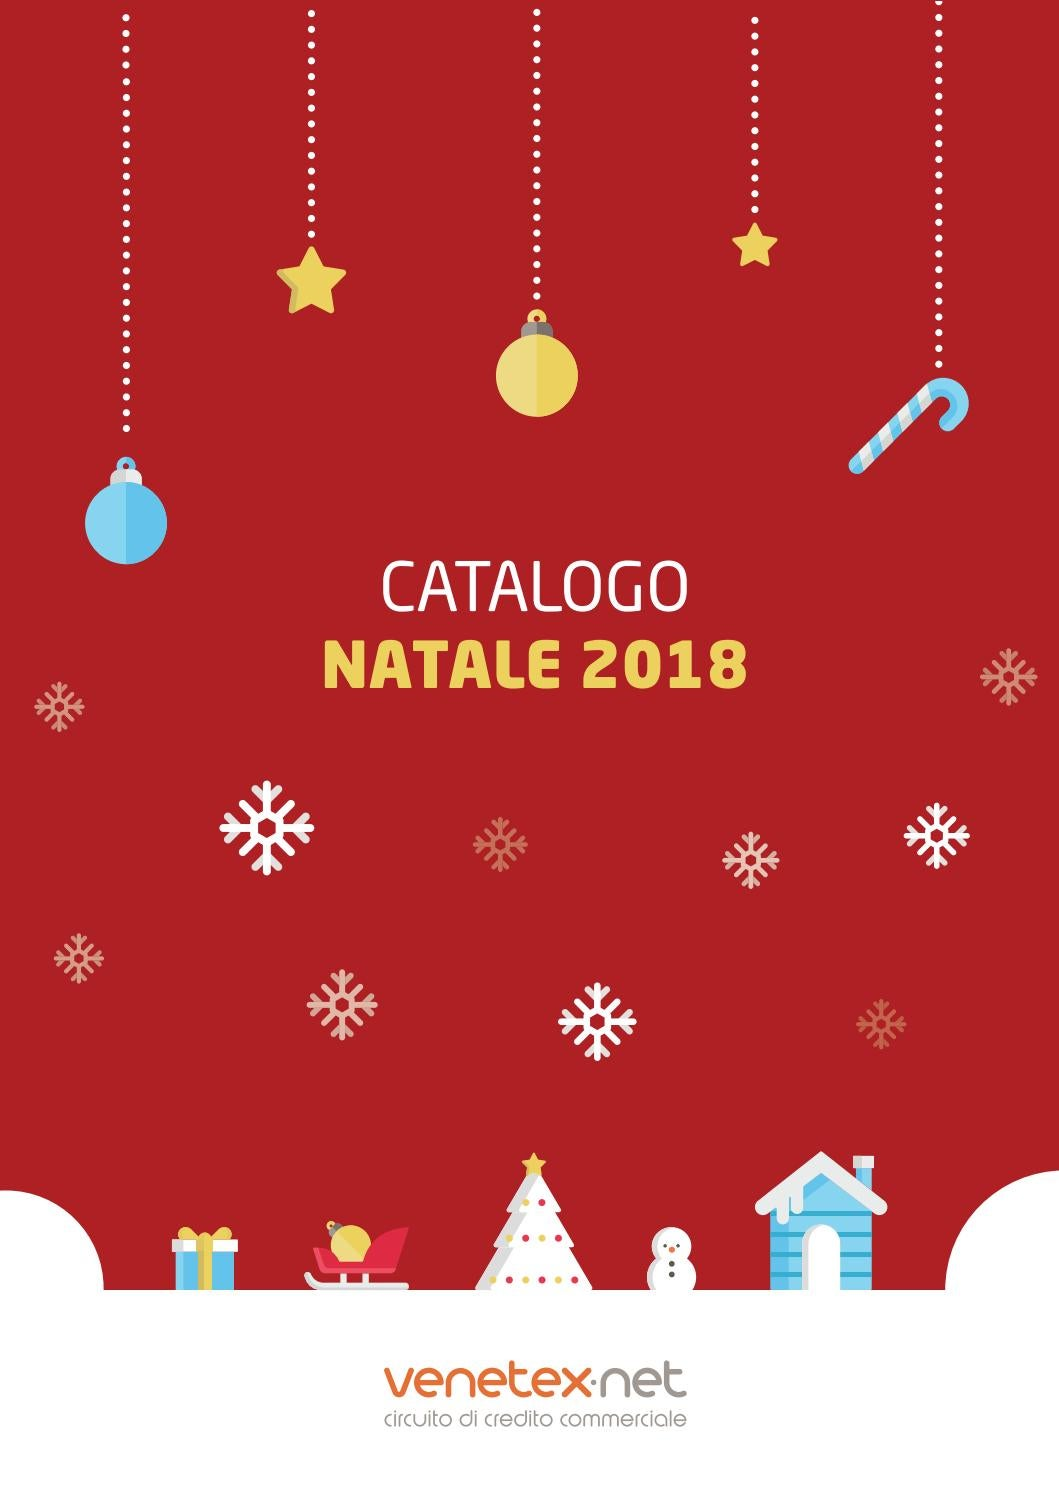 Auguri Di Buon Natale Qumran.Catalogo Venetex Natale 2018 By Venetex Net Issuu